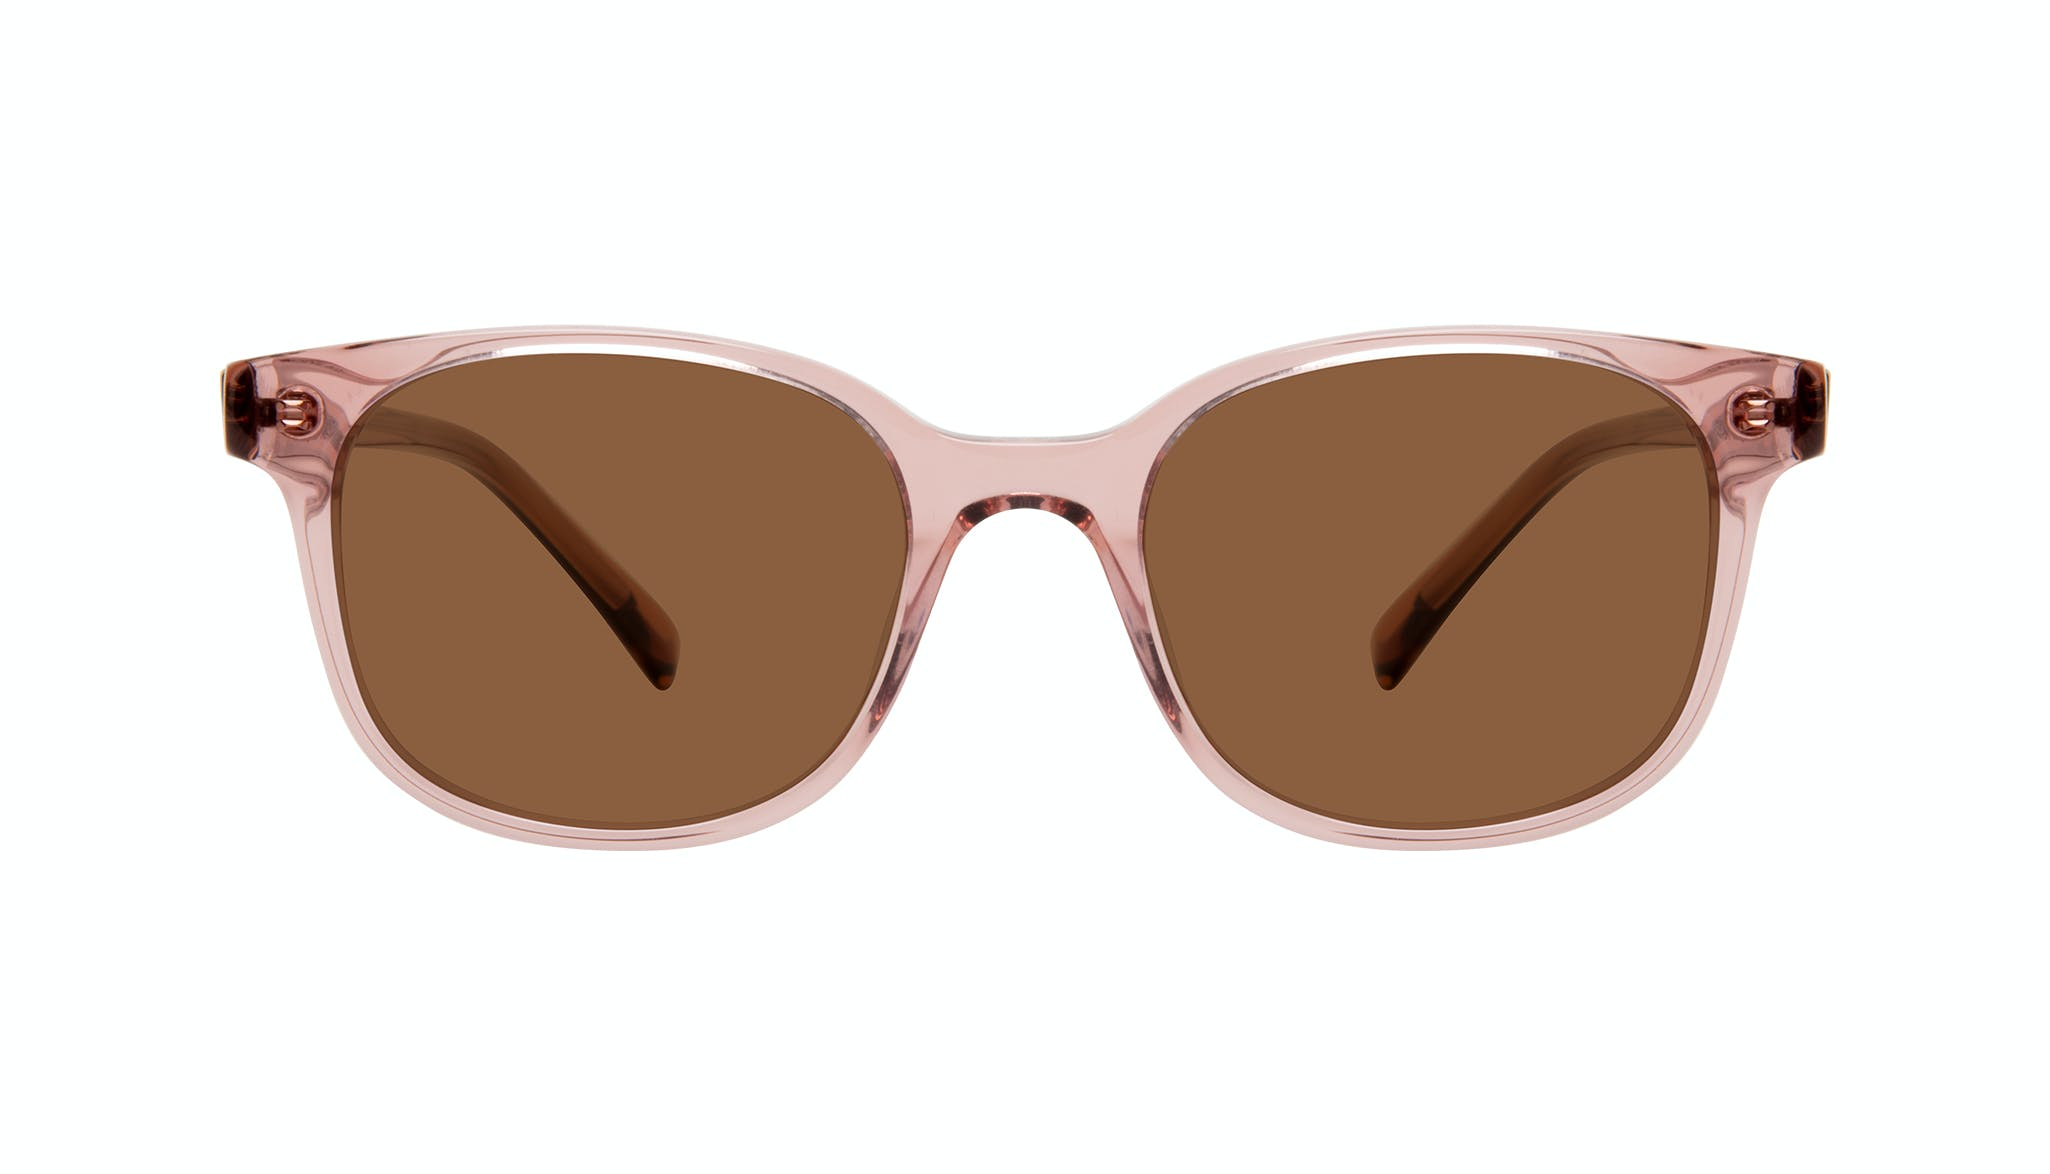 Affordable Fashion Glasses Square Eyeglasses Women Unique Rose